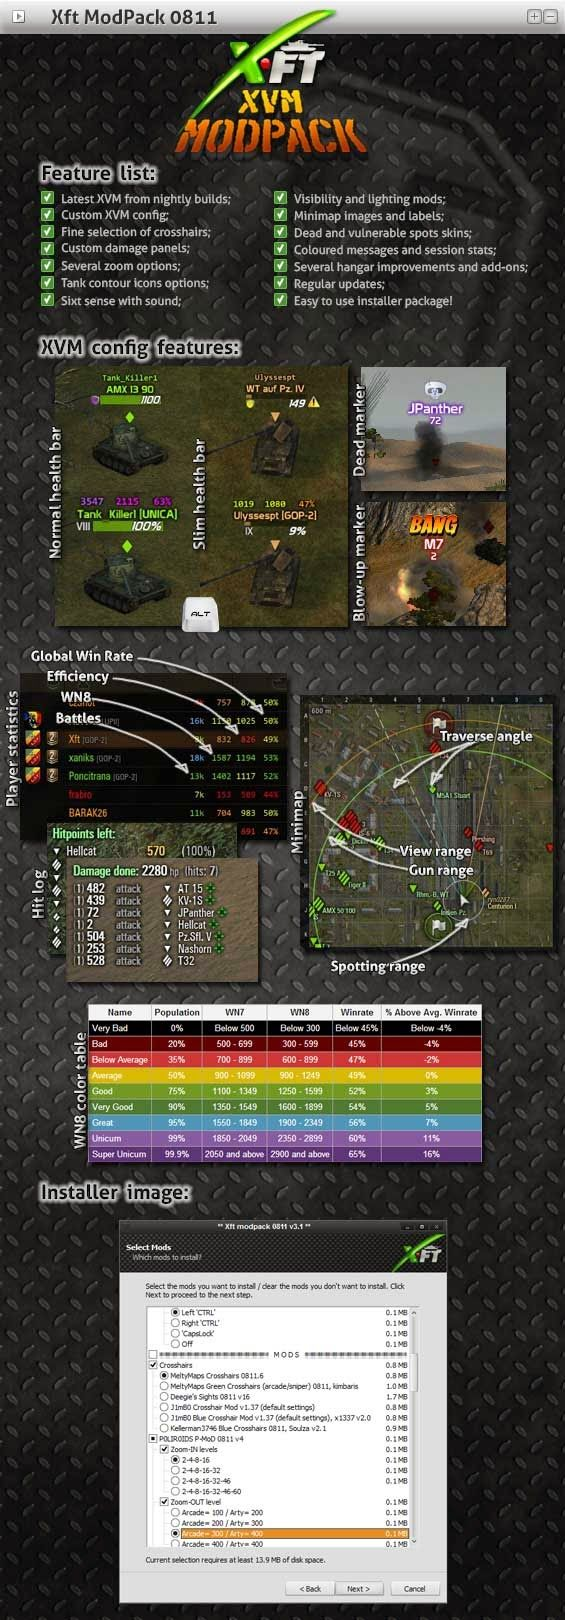 0 8 11] Xft' XVM modpack v3 2 (24-03-2014) - Mods & Addons